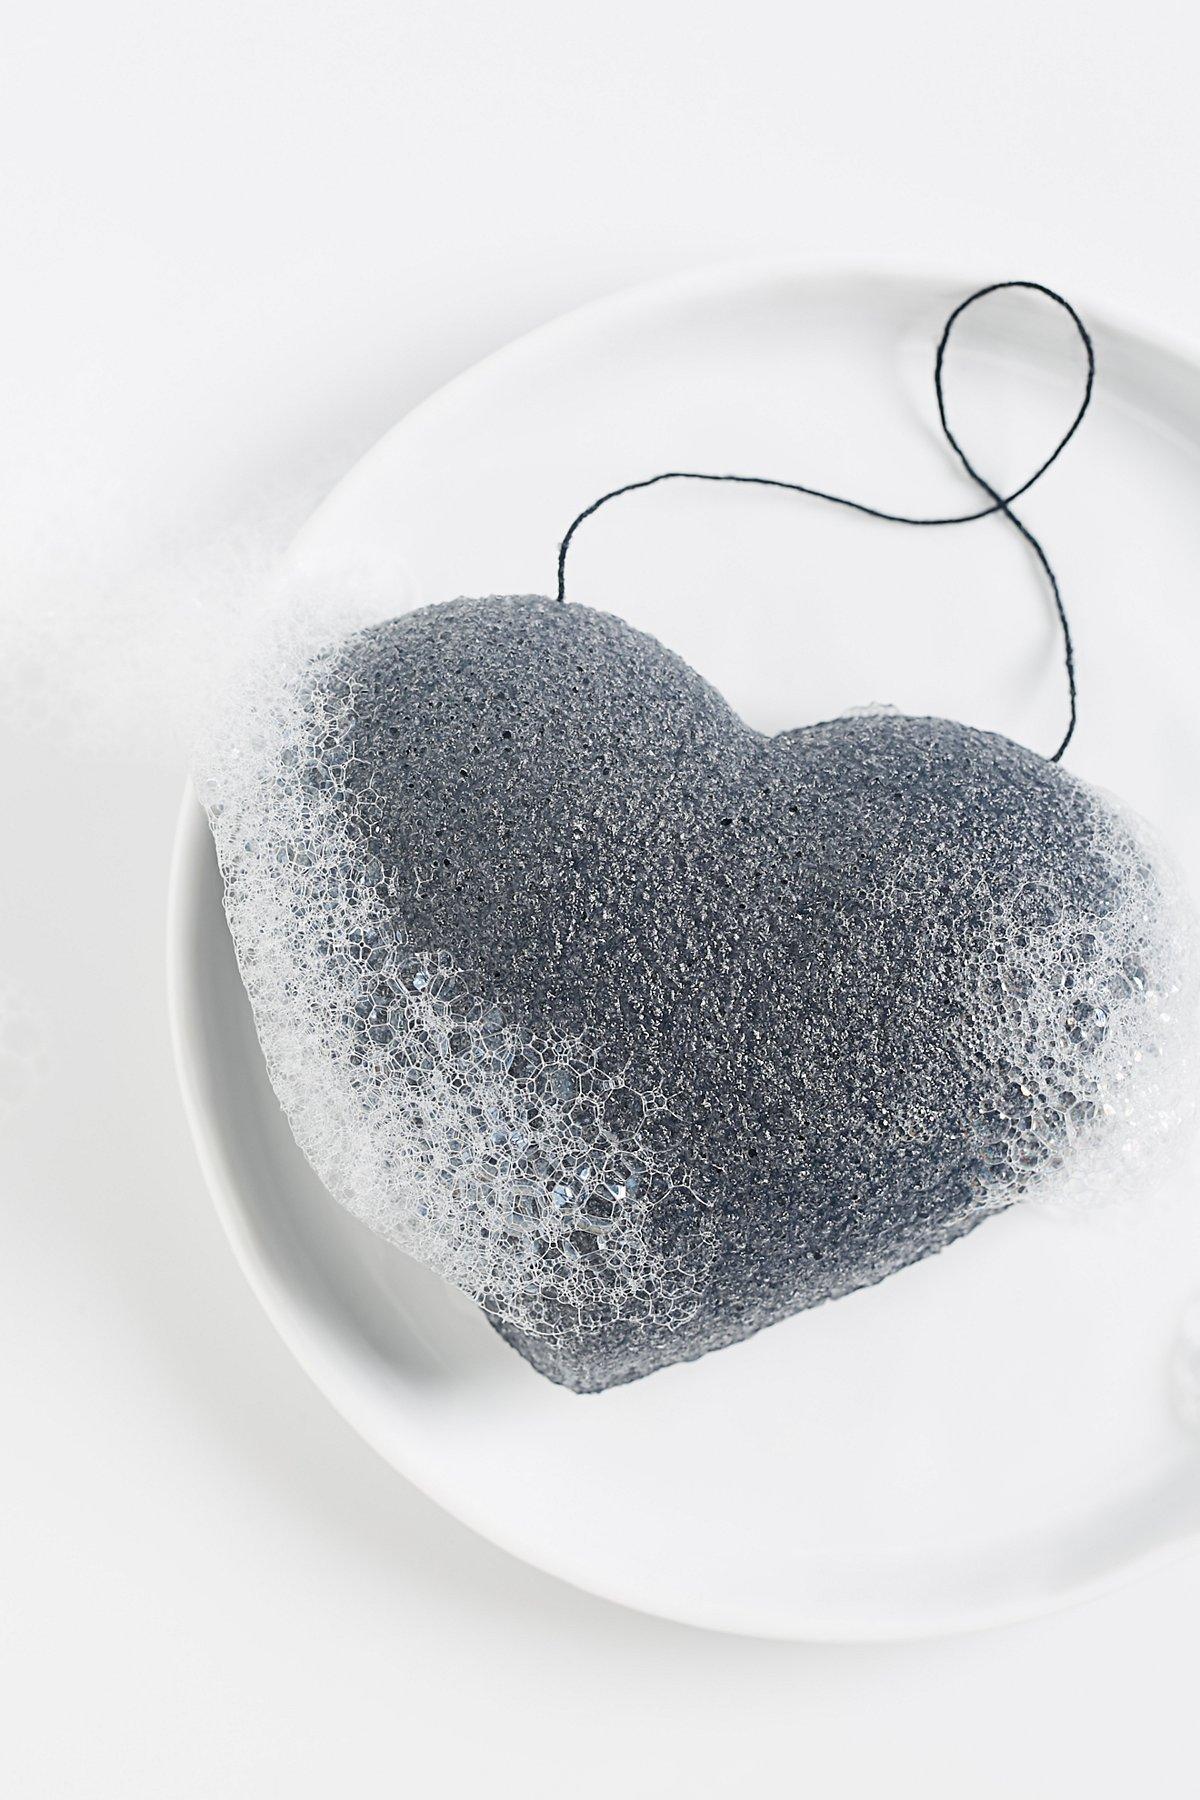 The Heart清洁海绵